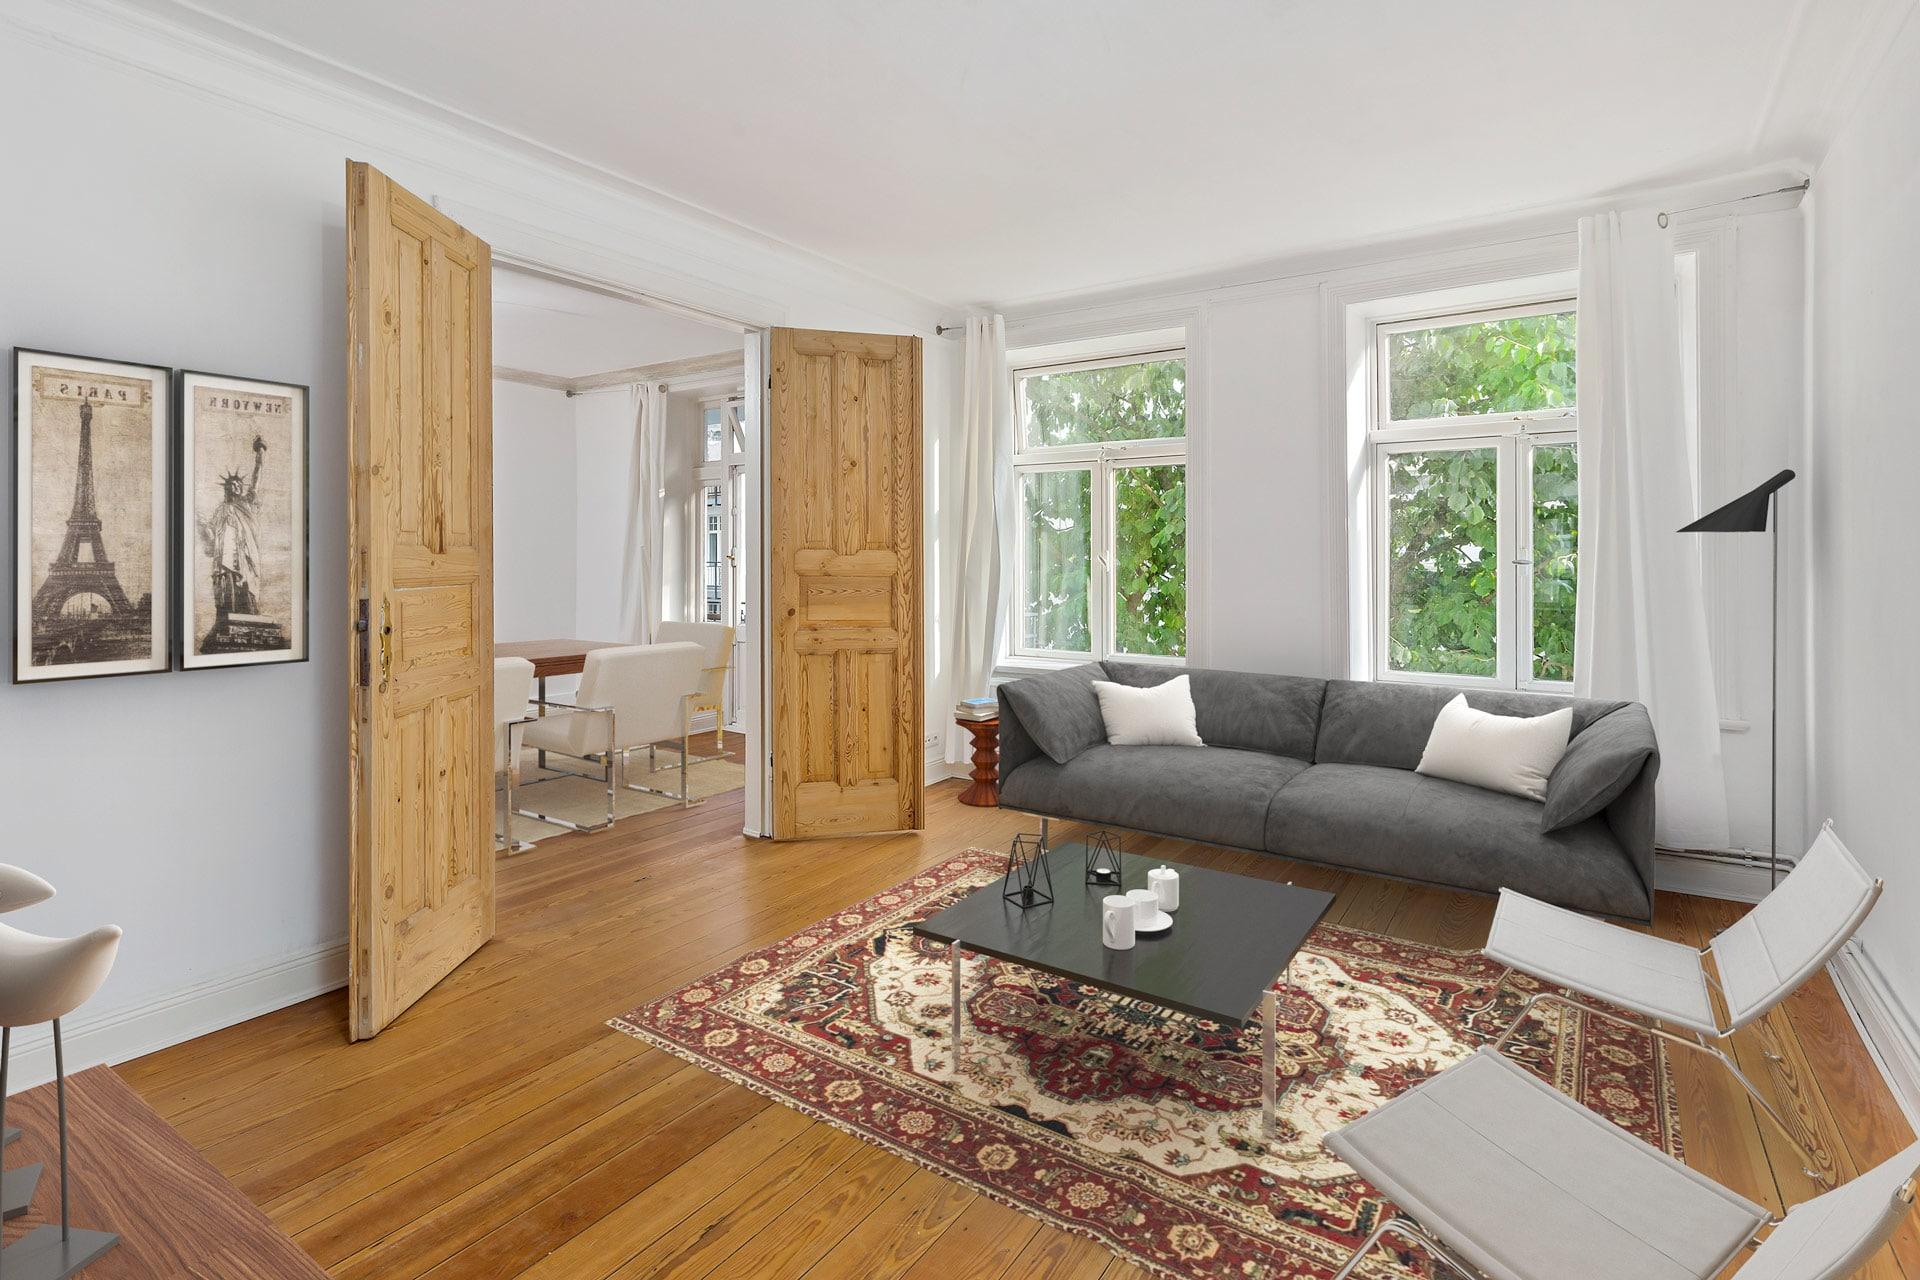 Virtuelles Home Staging Ergebnis